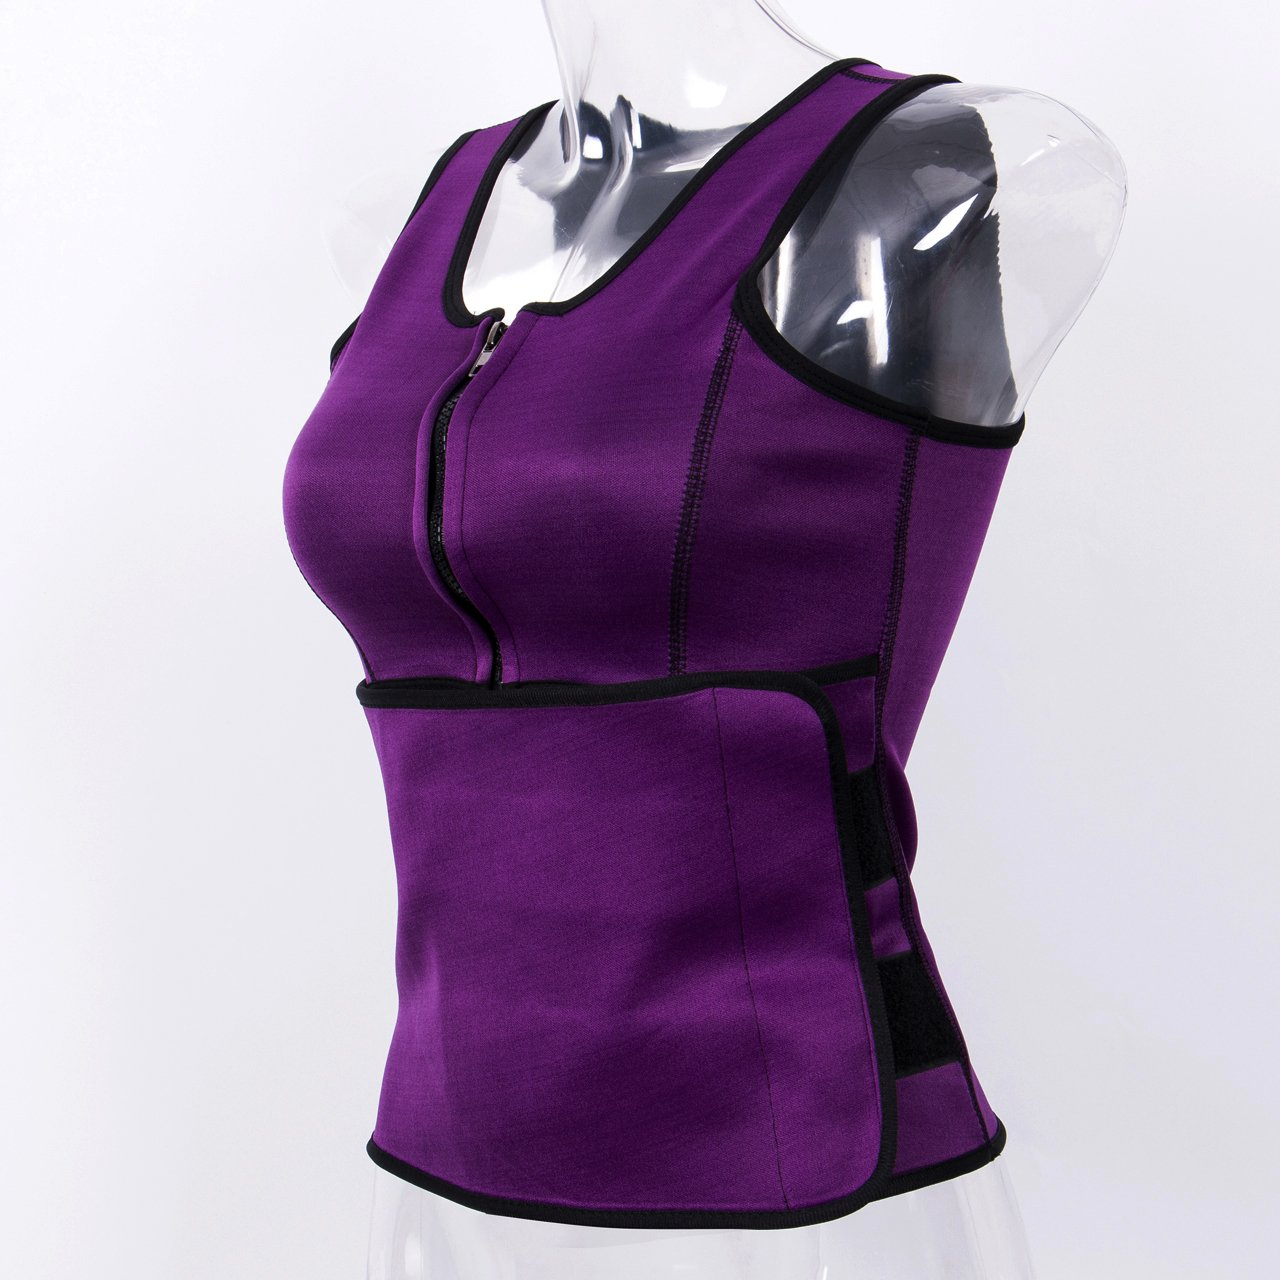 A AURA Women Sauna Suit Sweat Band and Vest Combined Waist Trimmer Vest Adjustable Waist Trimmer Belt Shapewear